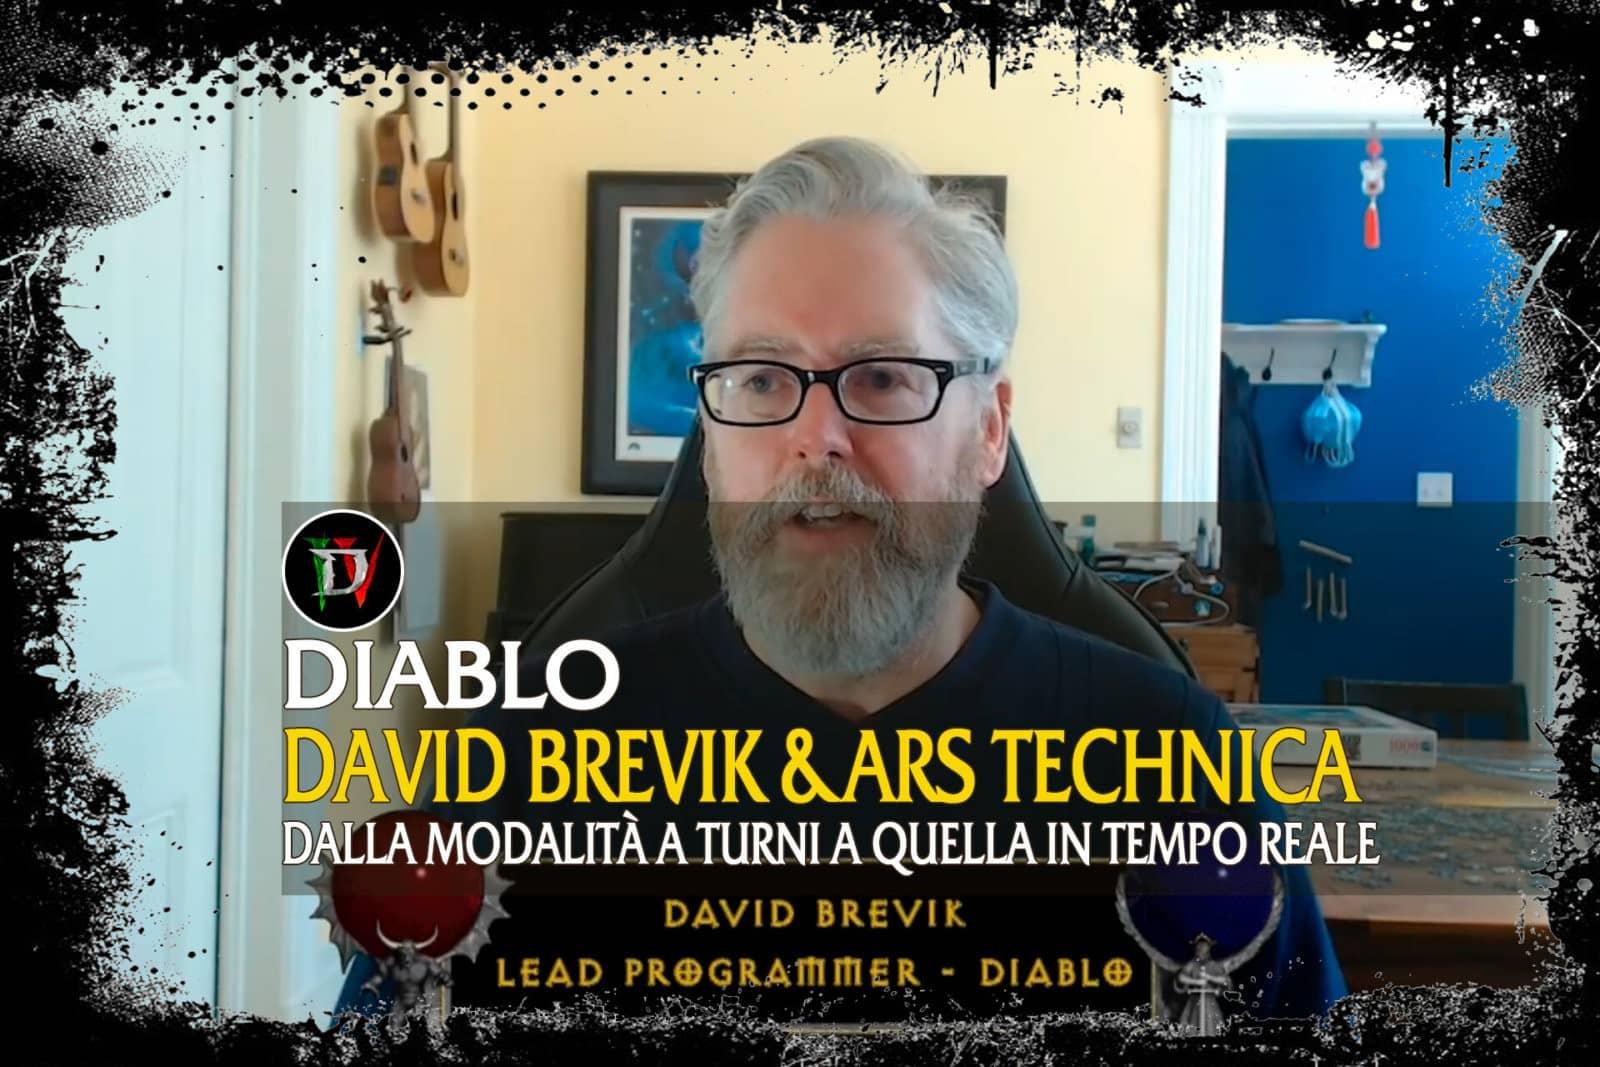 diablo ars technica intervista david brevik